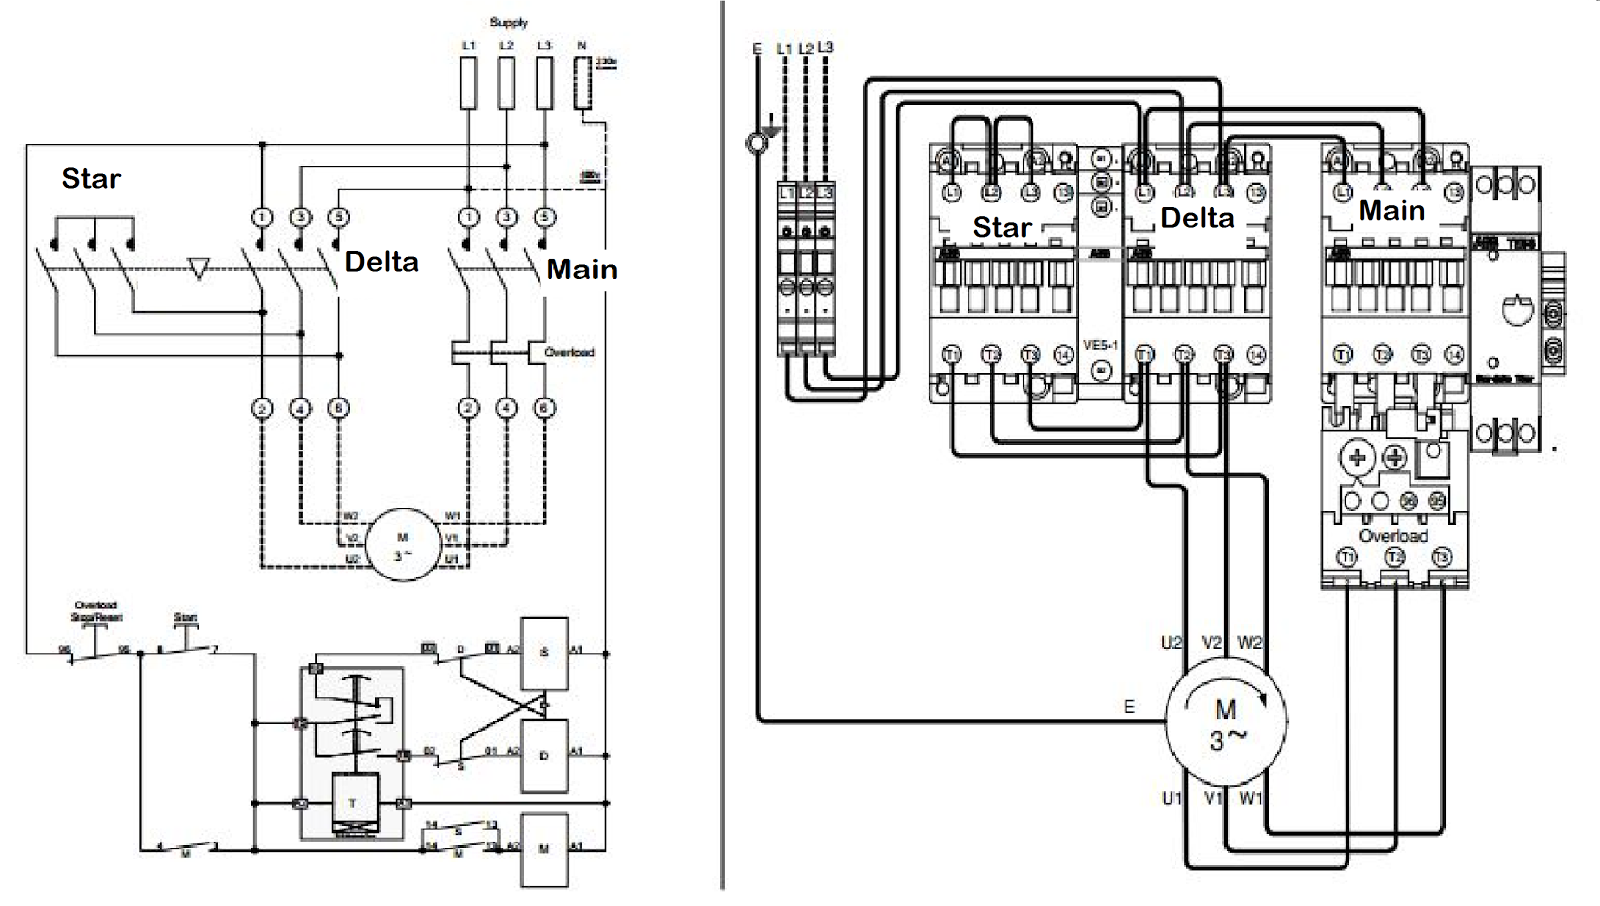 3 Phase Motor Wiring Diagram Star Delta Basic Electrical House Starter Connection Blog